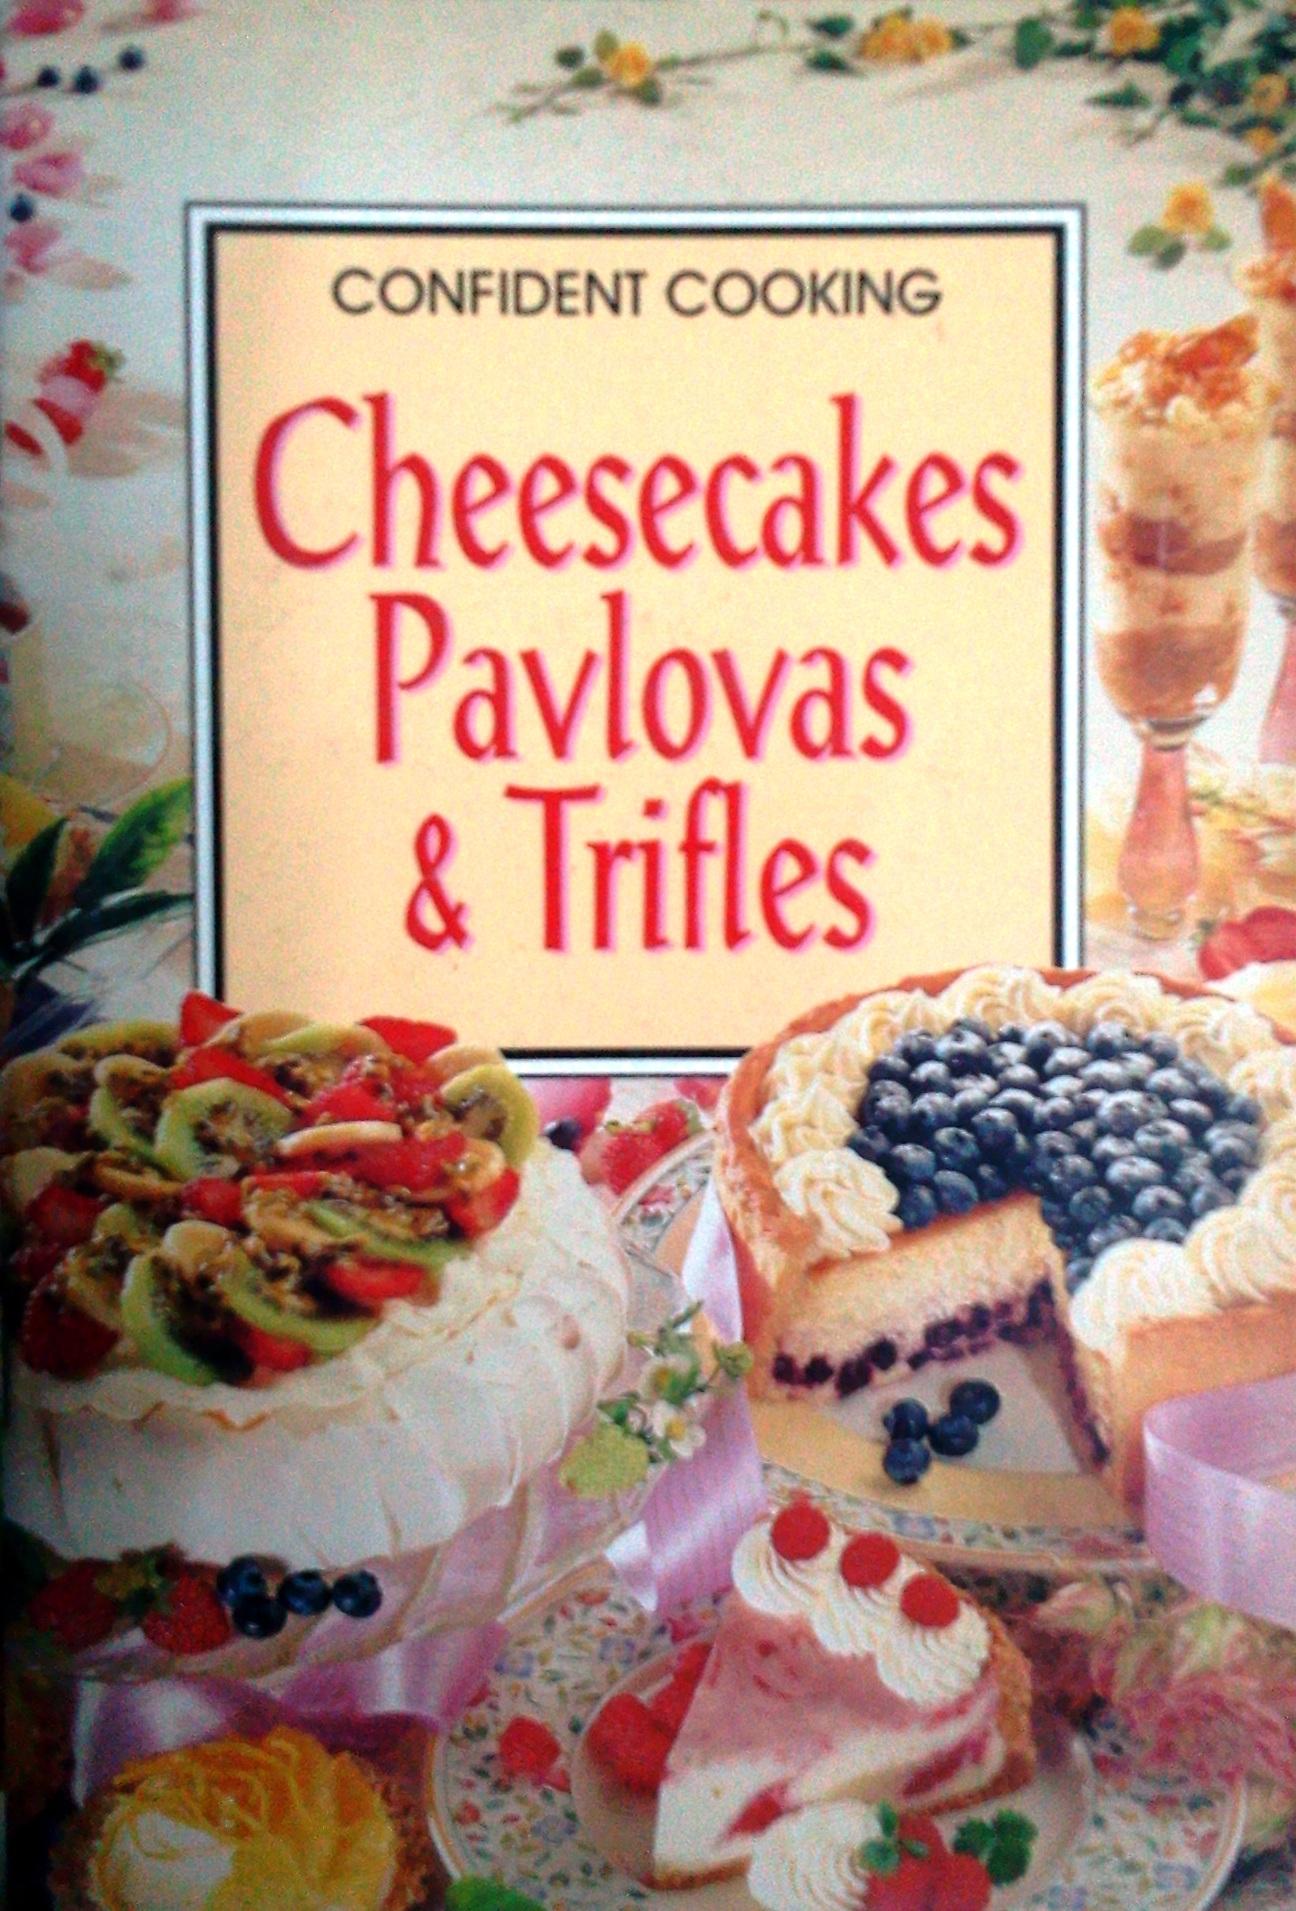 Cheesecakes, Pavlovas and Trifles